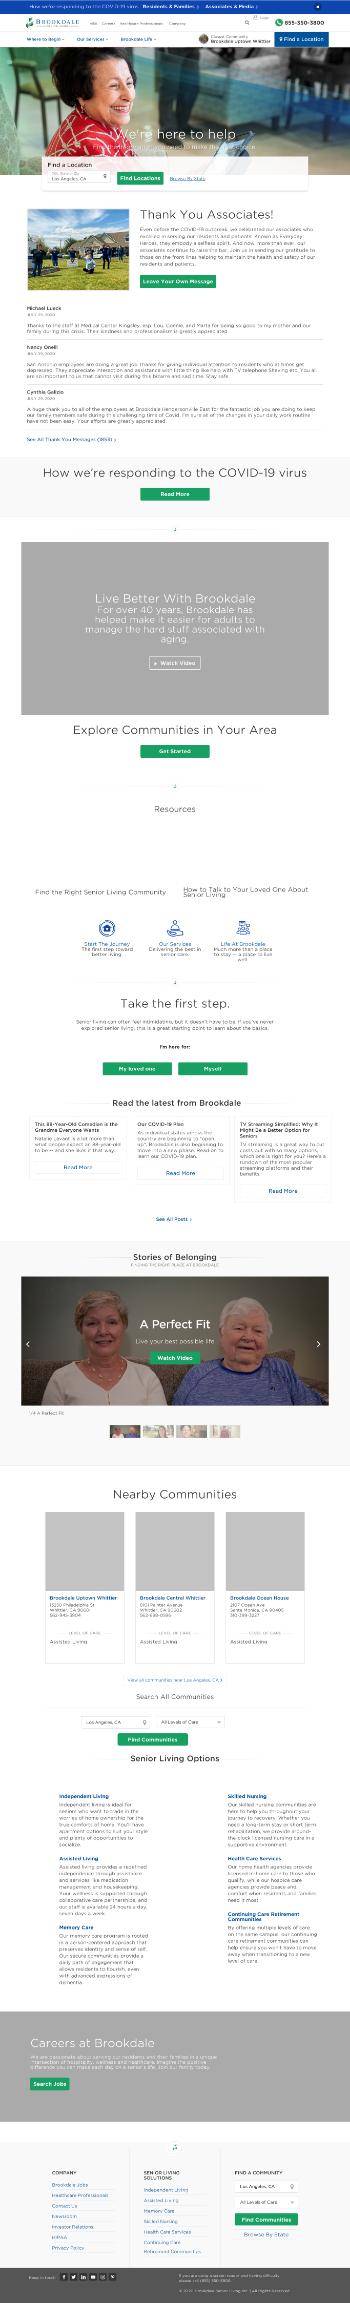 Brookdale Senior Living Inc. Website Screenshot